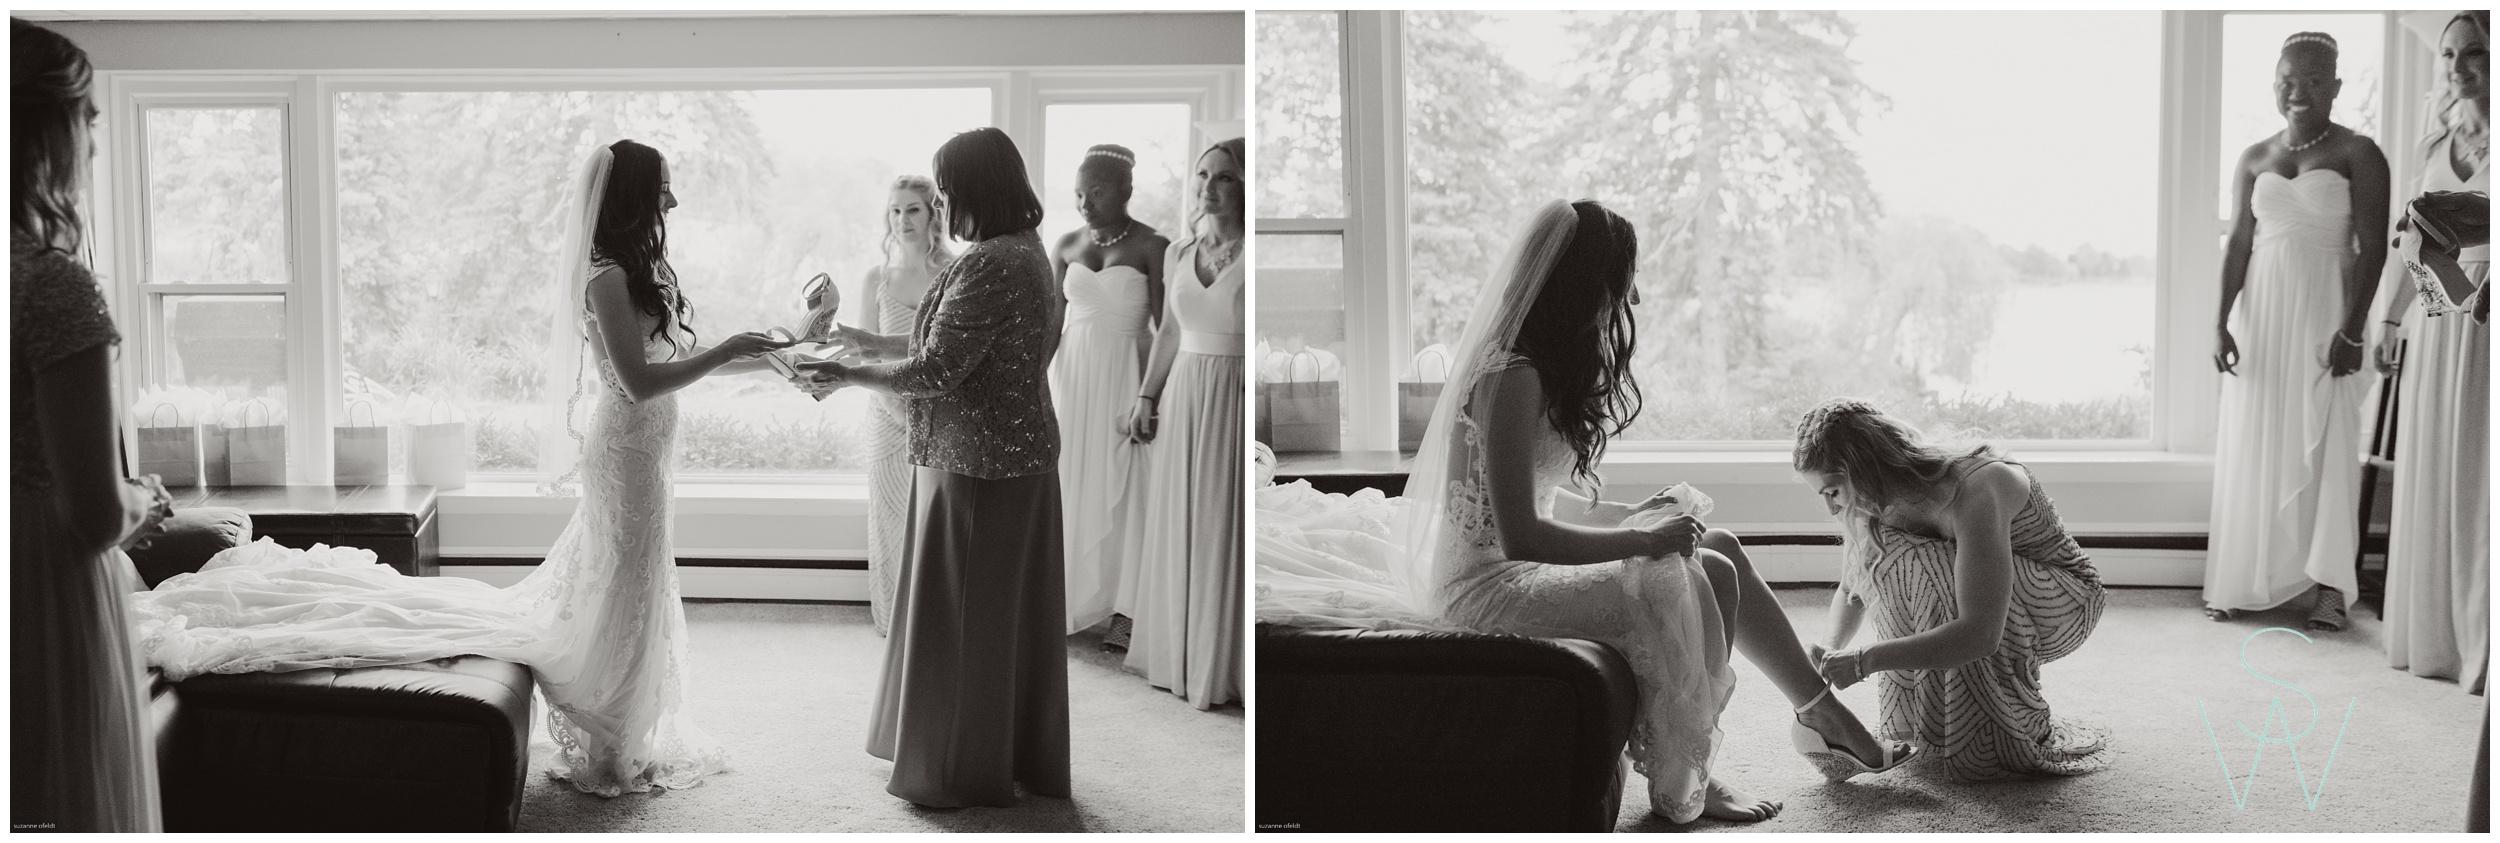 san.diego.wedding.photography_0113.jpg